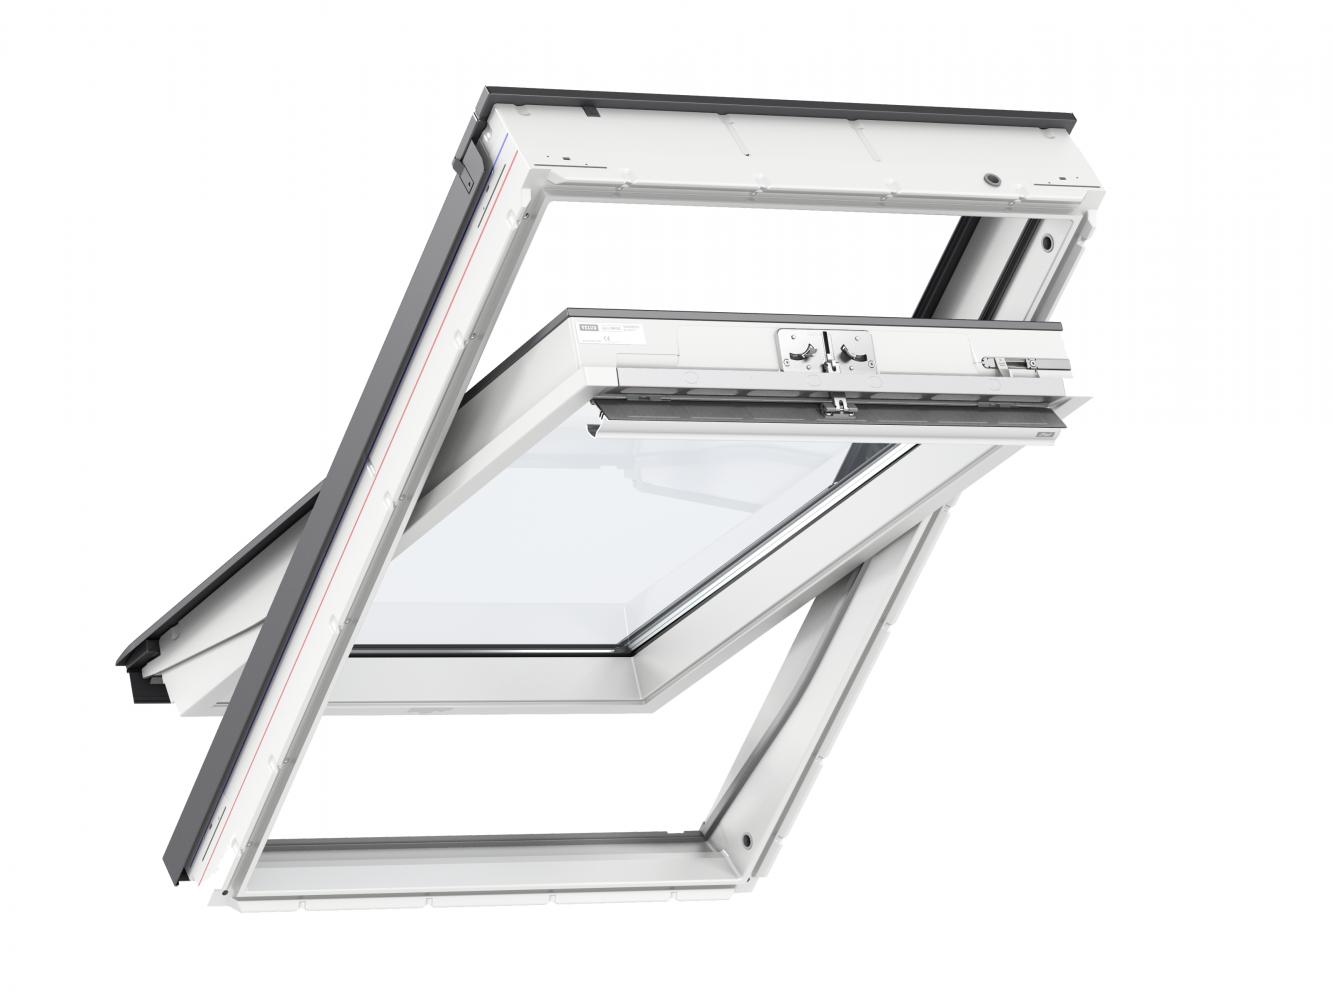 Fereastra de mansarda poliuretan Velux GLU 0051 Standard, deschidere de sus, MK06 78x118 cm